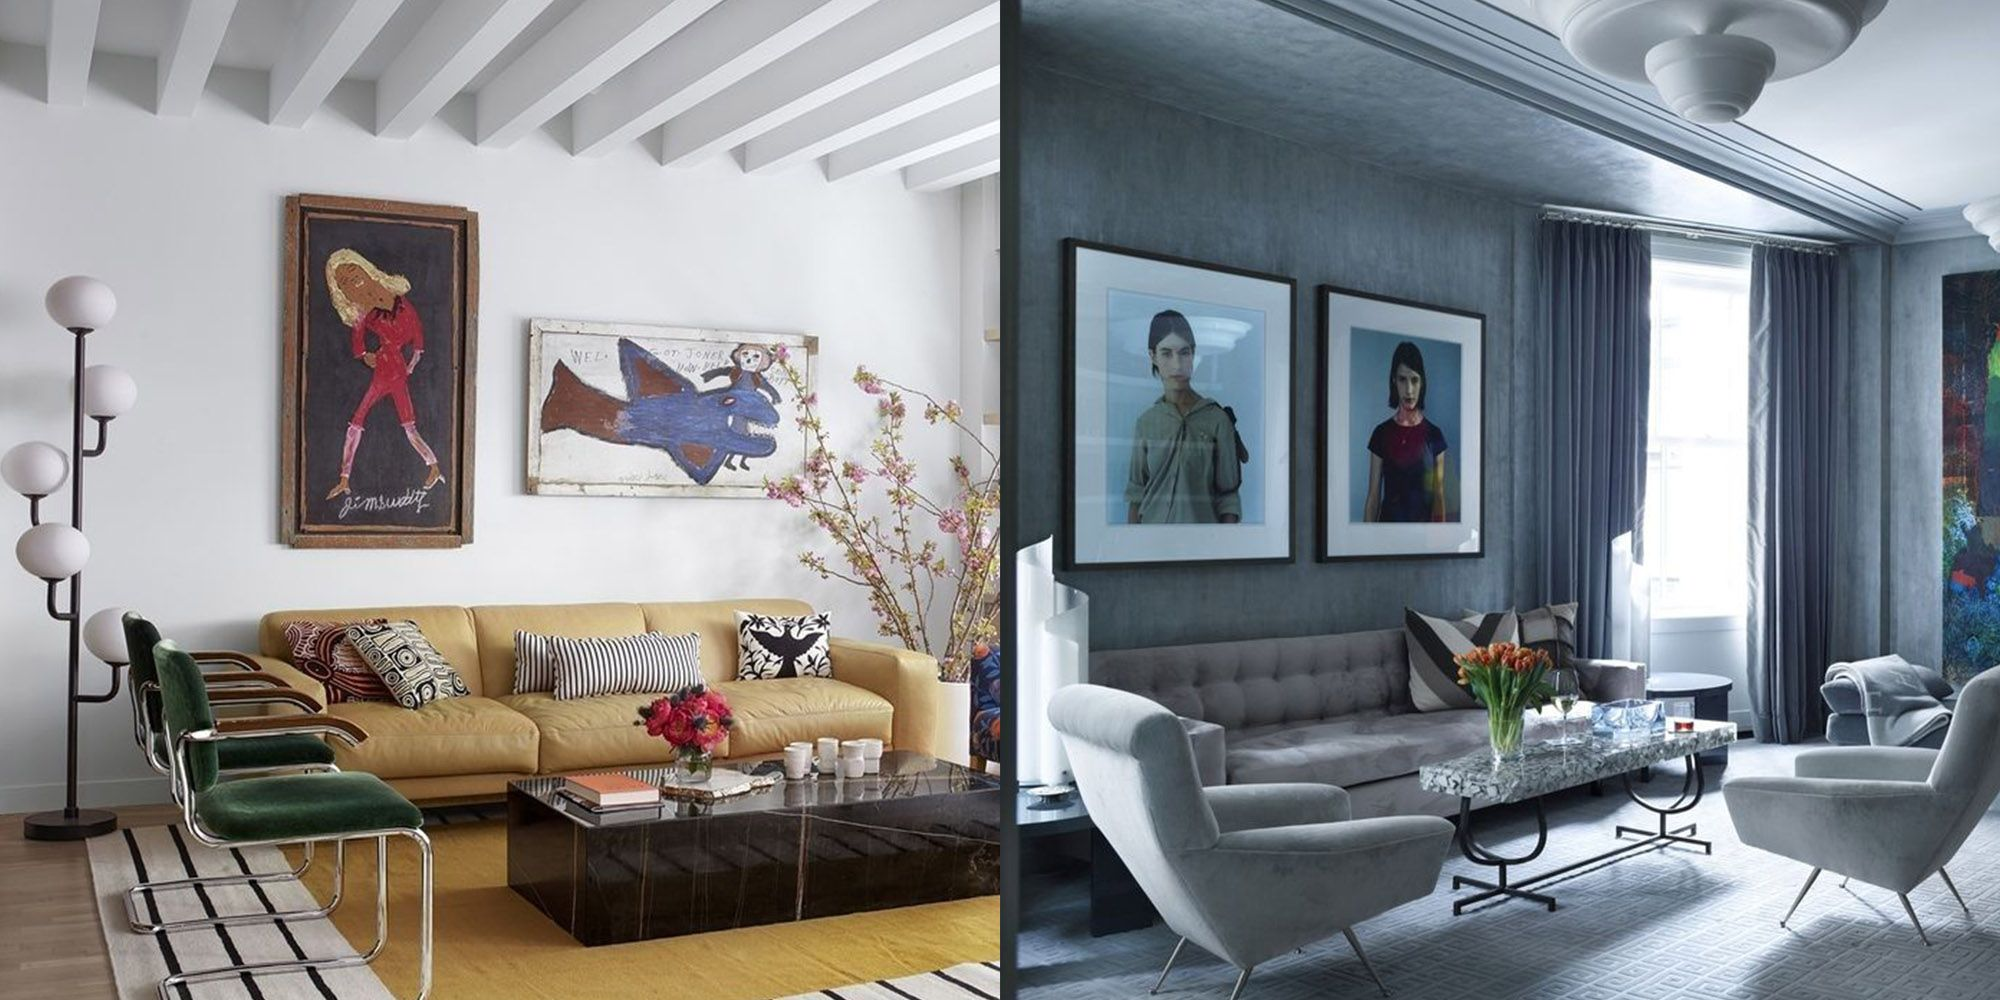 interior design living room modern contemporary images of hardwood floors in rooms versus mid century vs